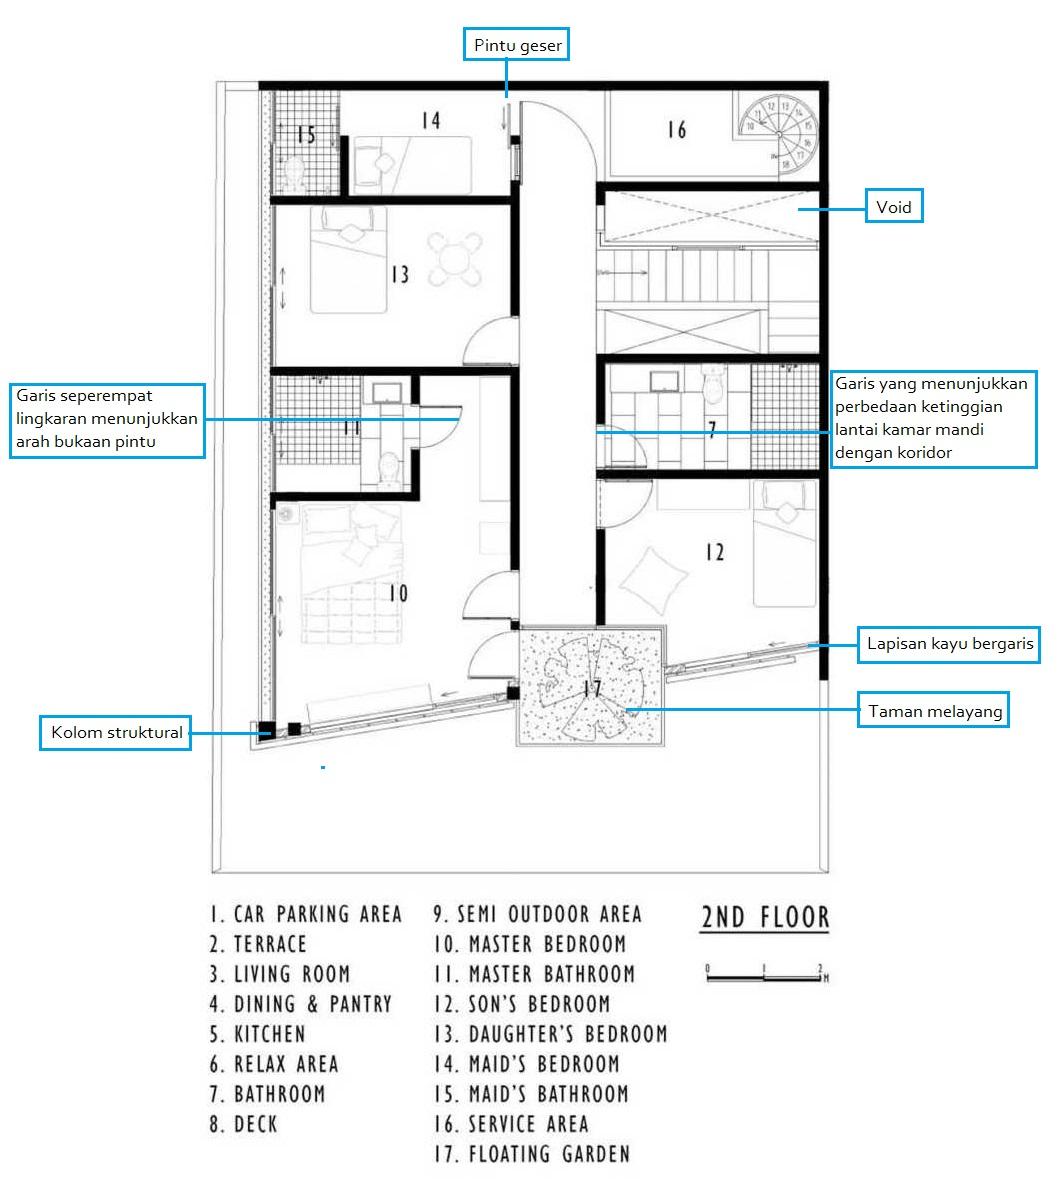 Inset House di Jatibening, Bekasi karya Delution Architect (Sumber: arsitag.com)